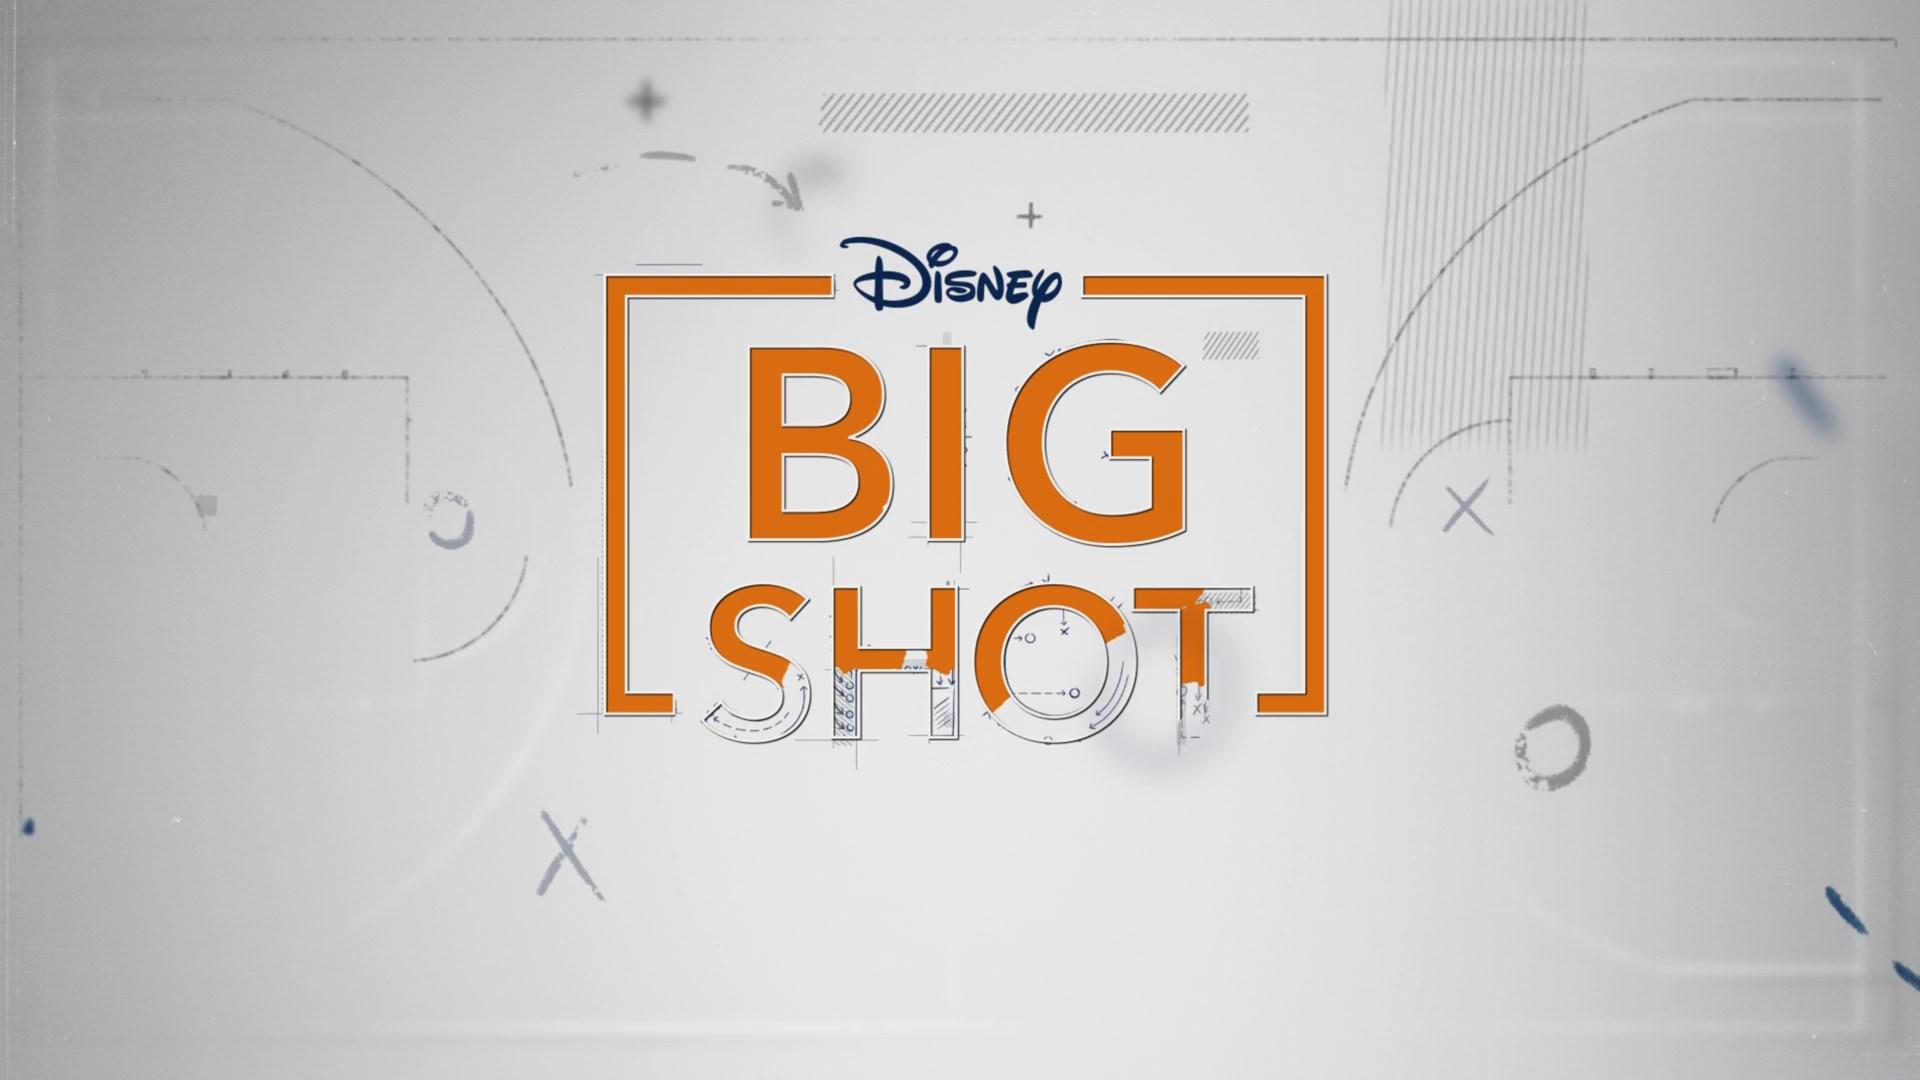 Big Shot: Entrenador de Elite Temporada 1 (2021) 1080p WEB-DL Latino